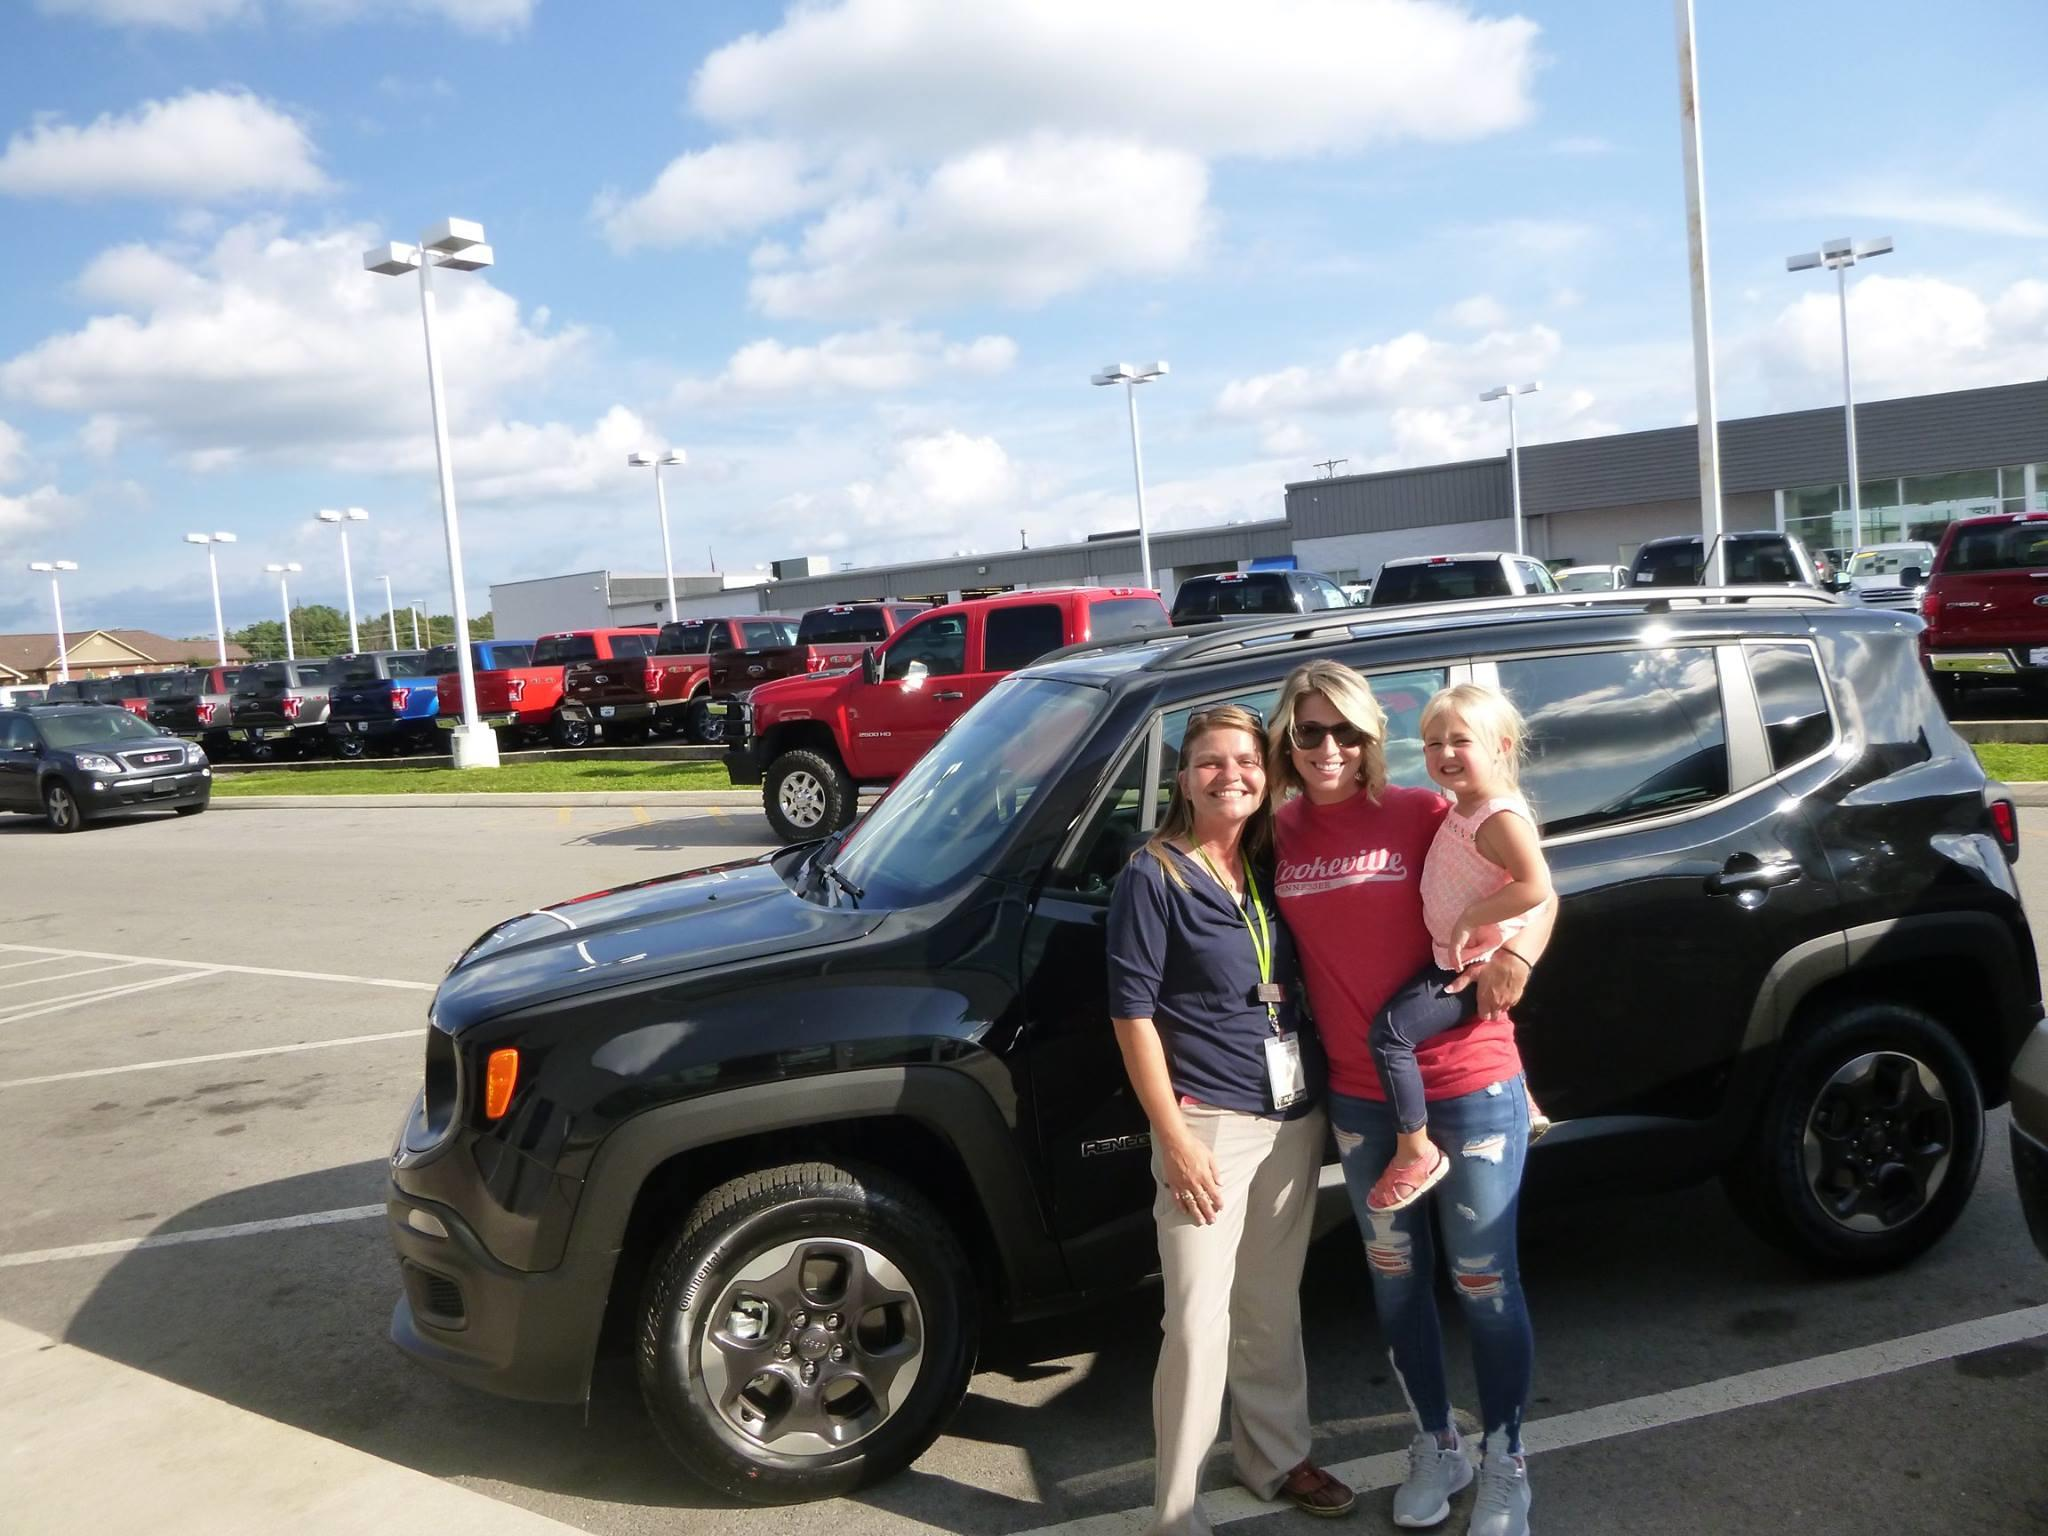 East Tn Dodge >> East Tennessee Dodge Chrysler Jeep Ram Car Dealer Crossville Tn